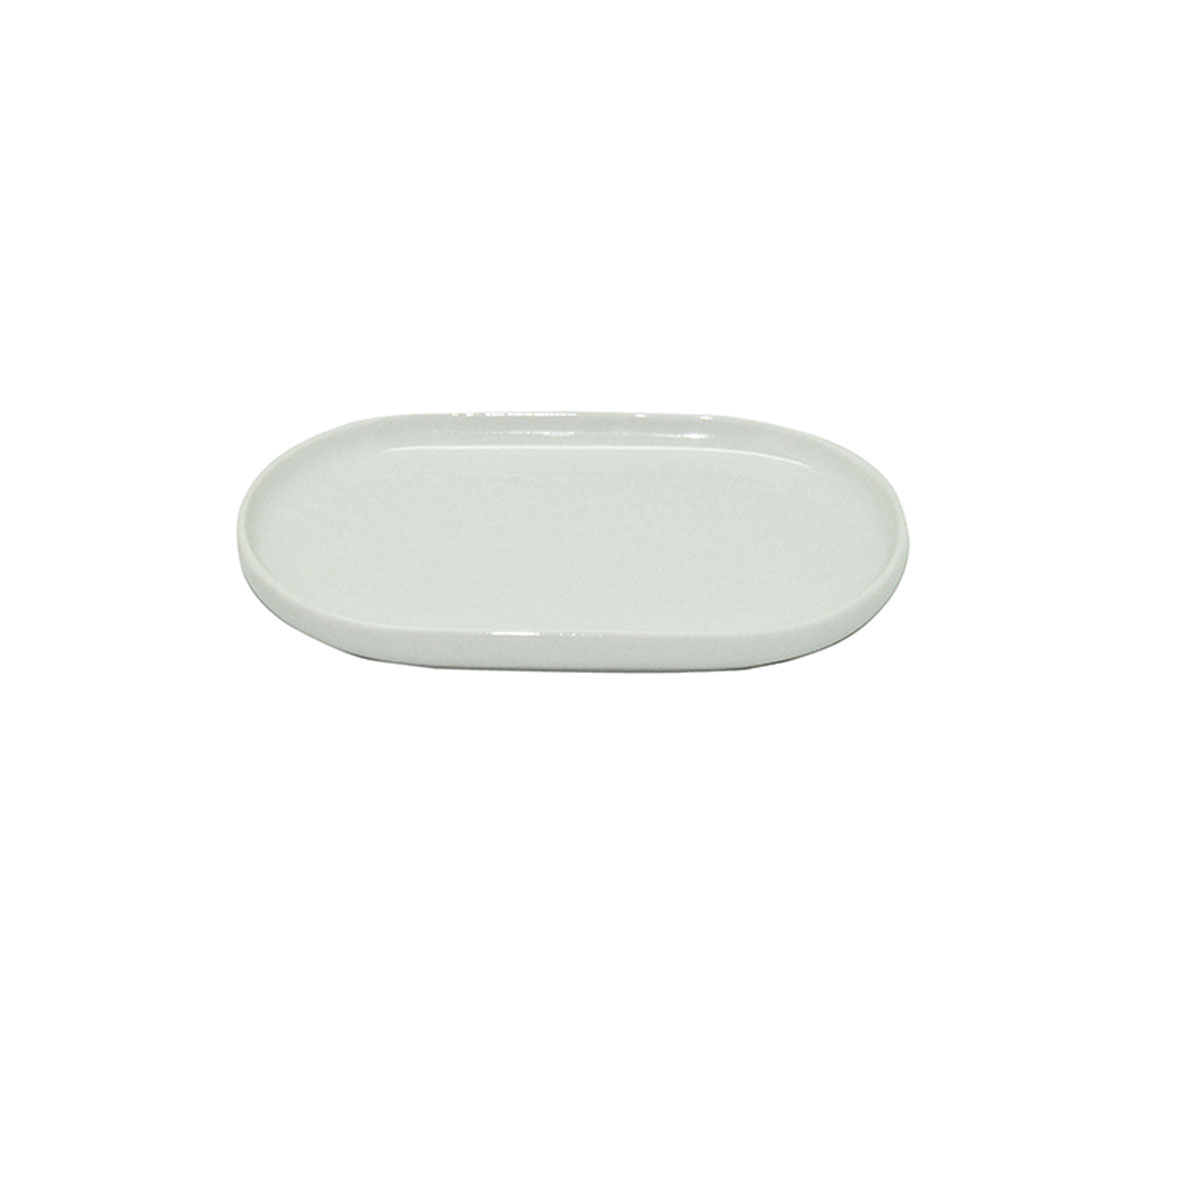 Porte savon en porcelaine blanc